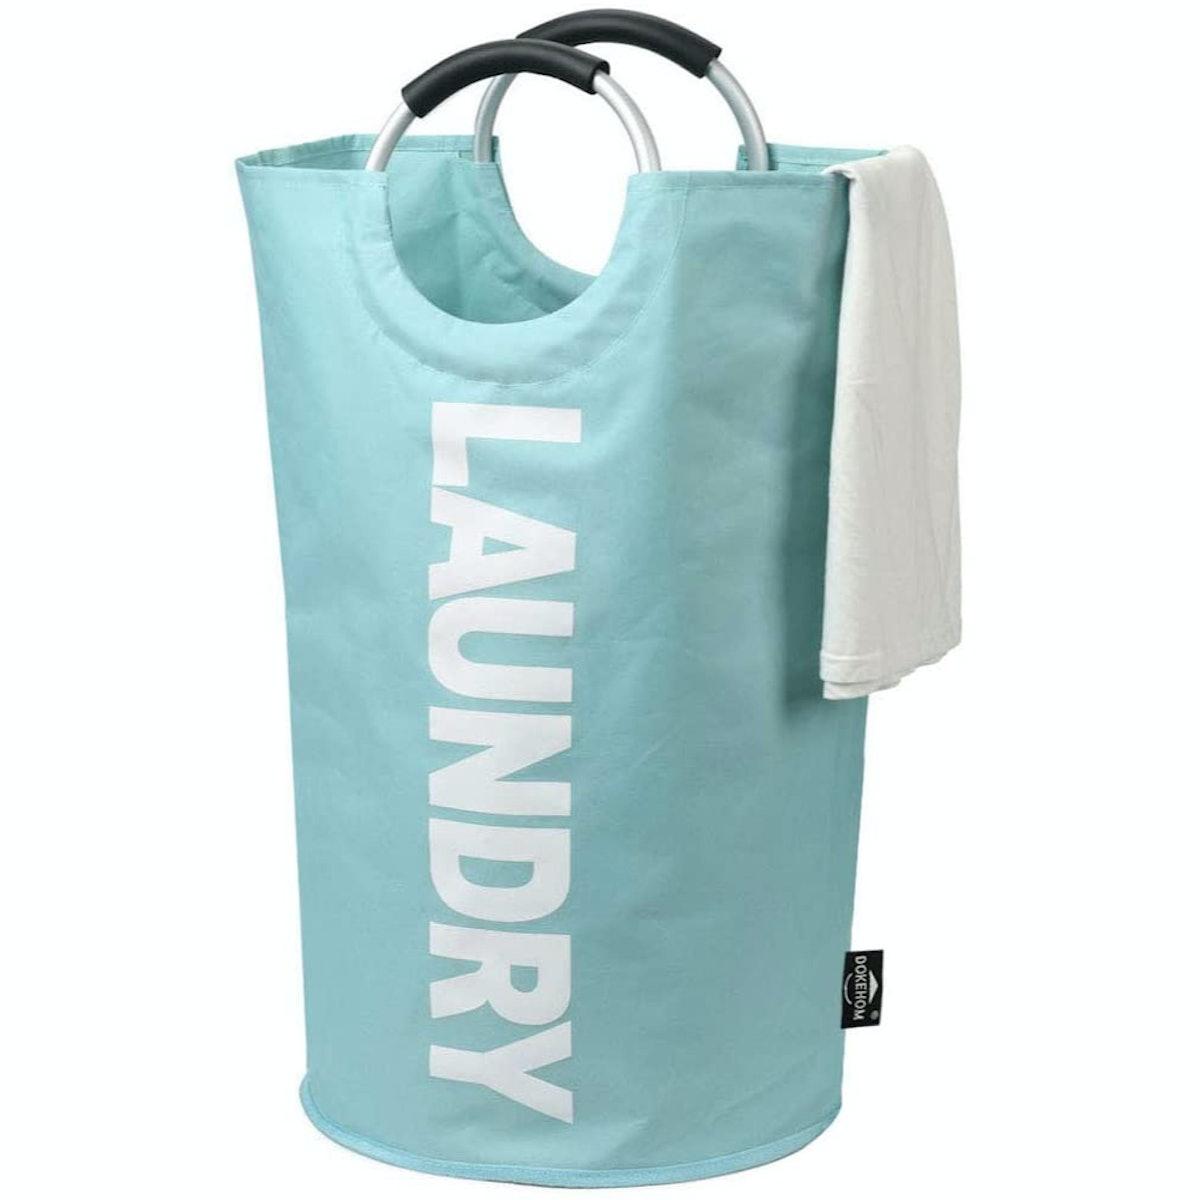 DOKEHOM Laundry Bag